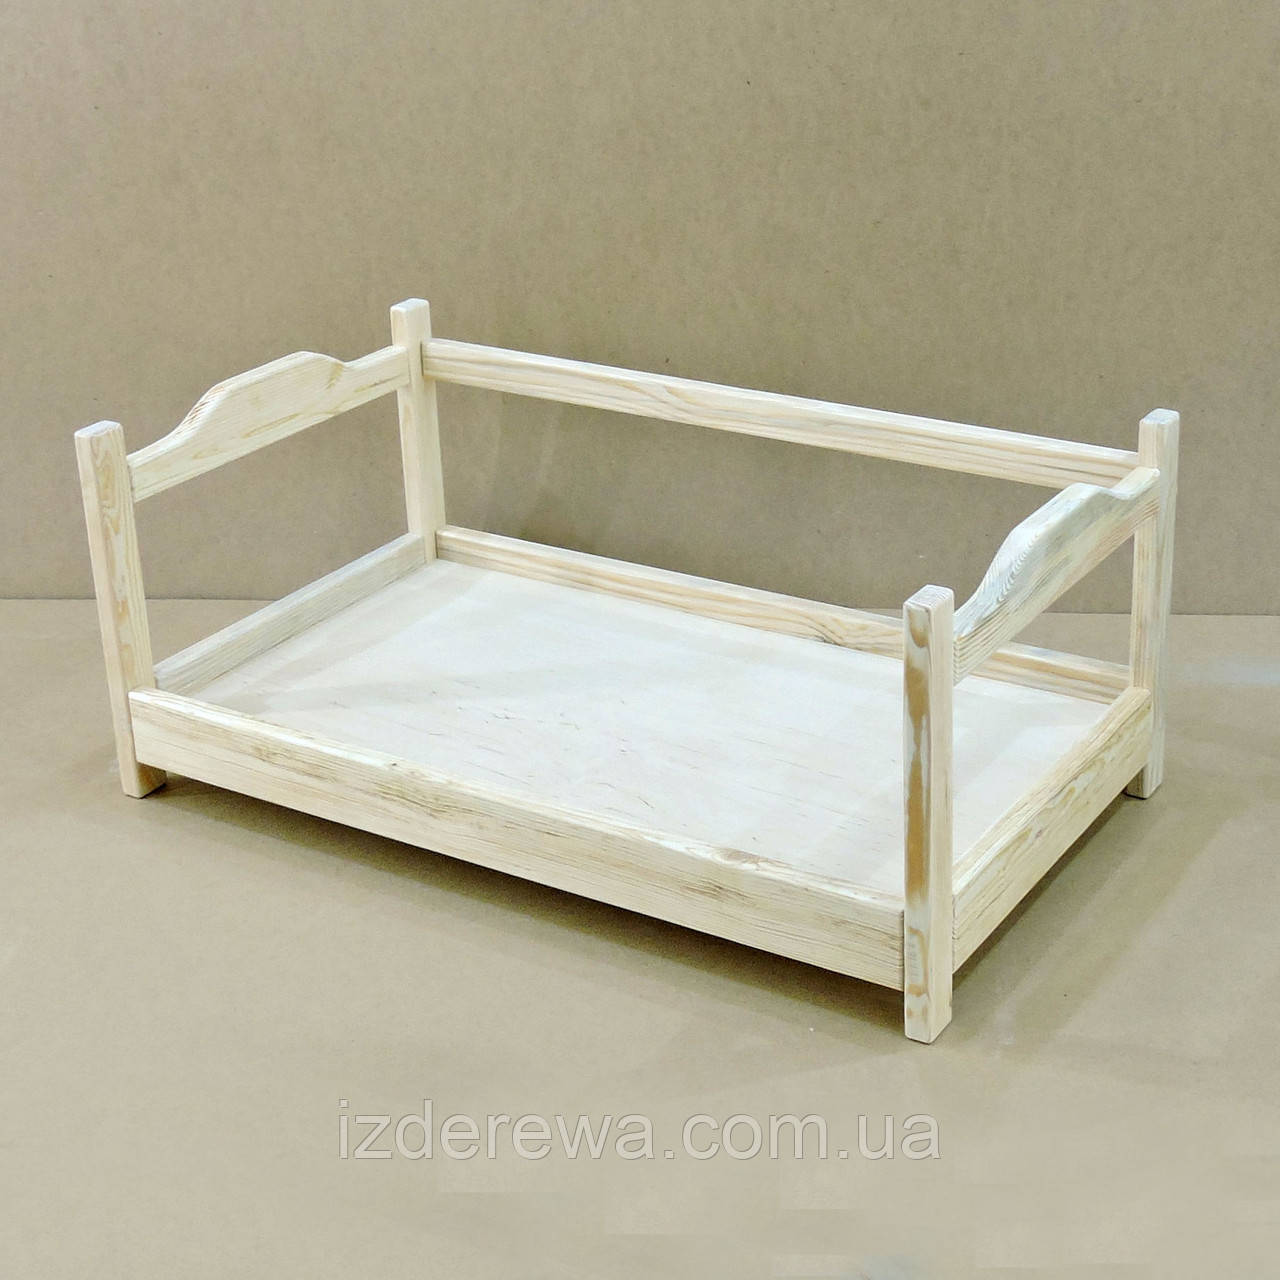 "Лежак дерев'яний для собаки ""Рамзай 105х60"" бланже"